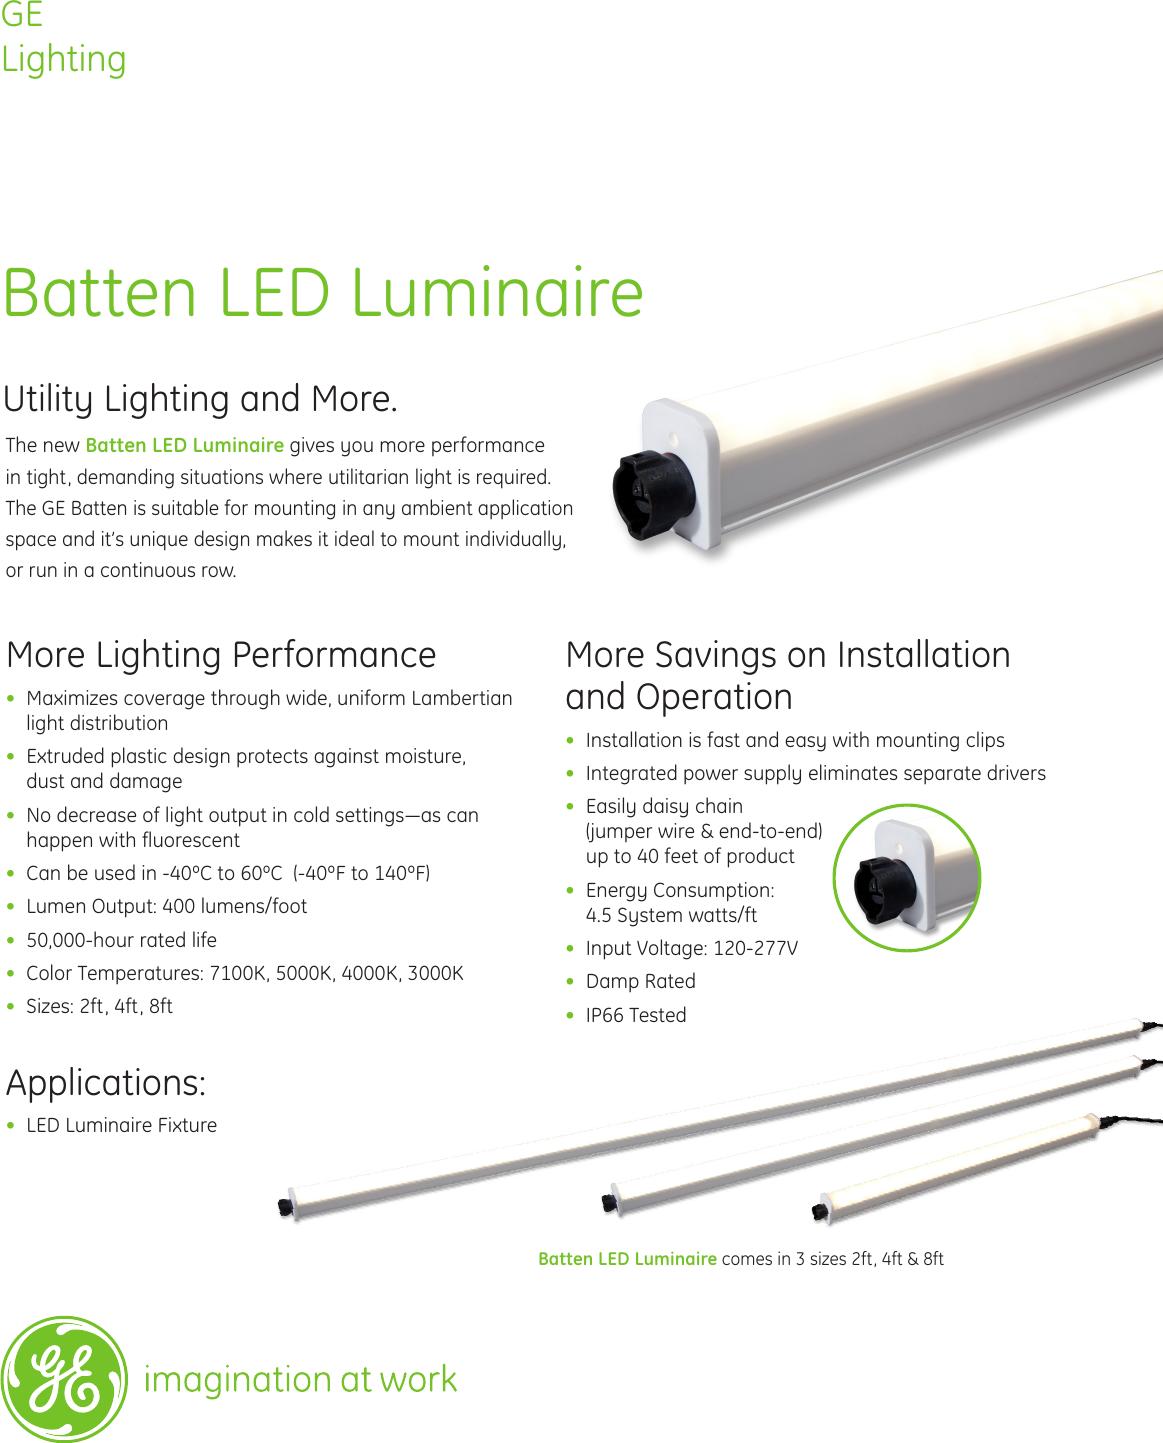 Ge Appliances Batten Led Specification Sheet Lighting Signage Wiring A Light Datasheet Sign128